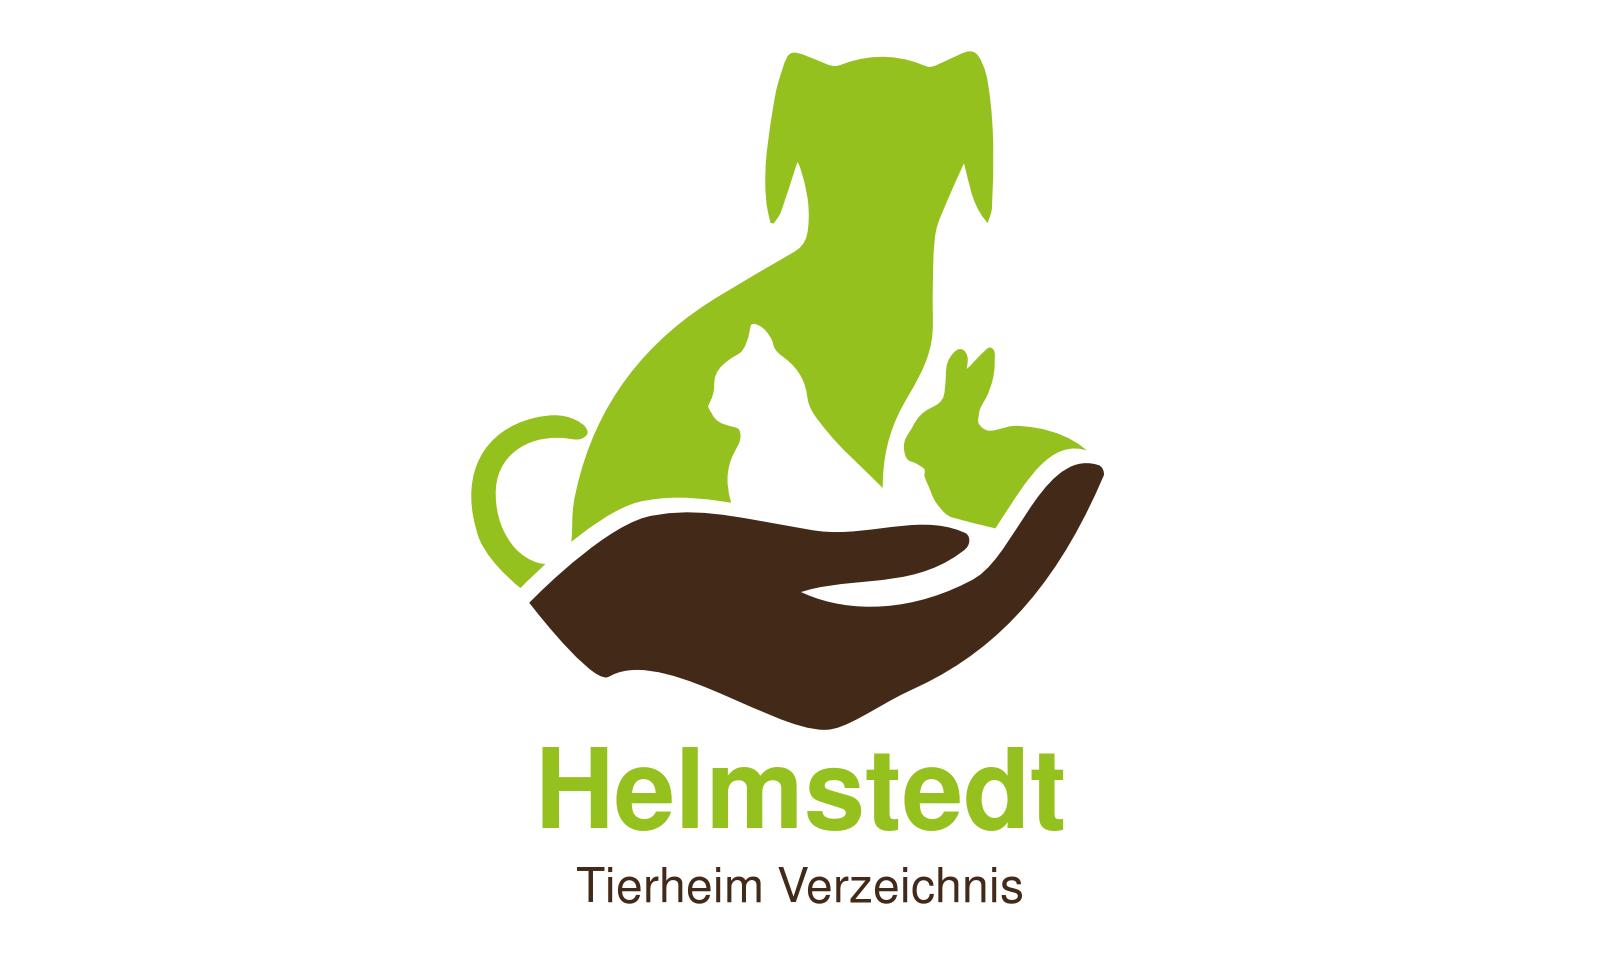 Tierheim Helmstedt